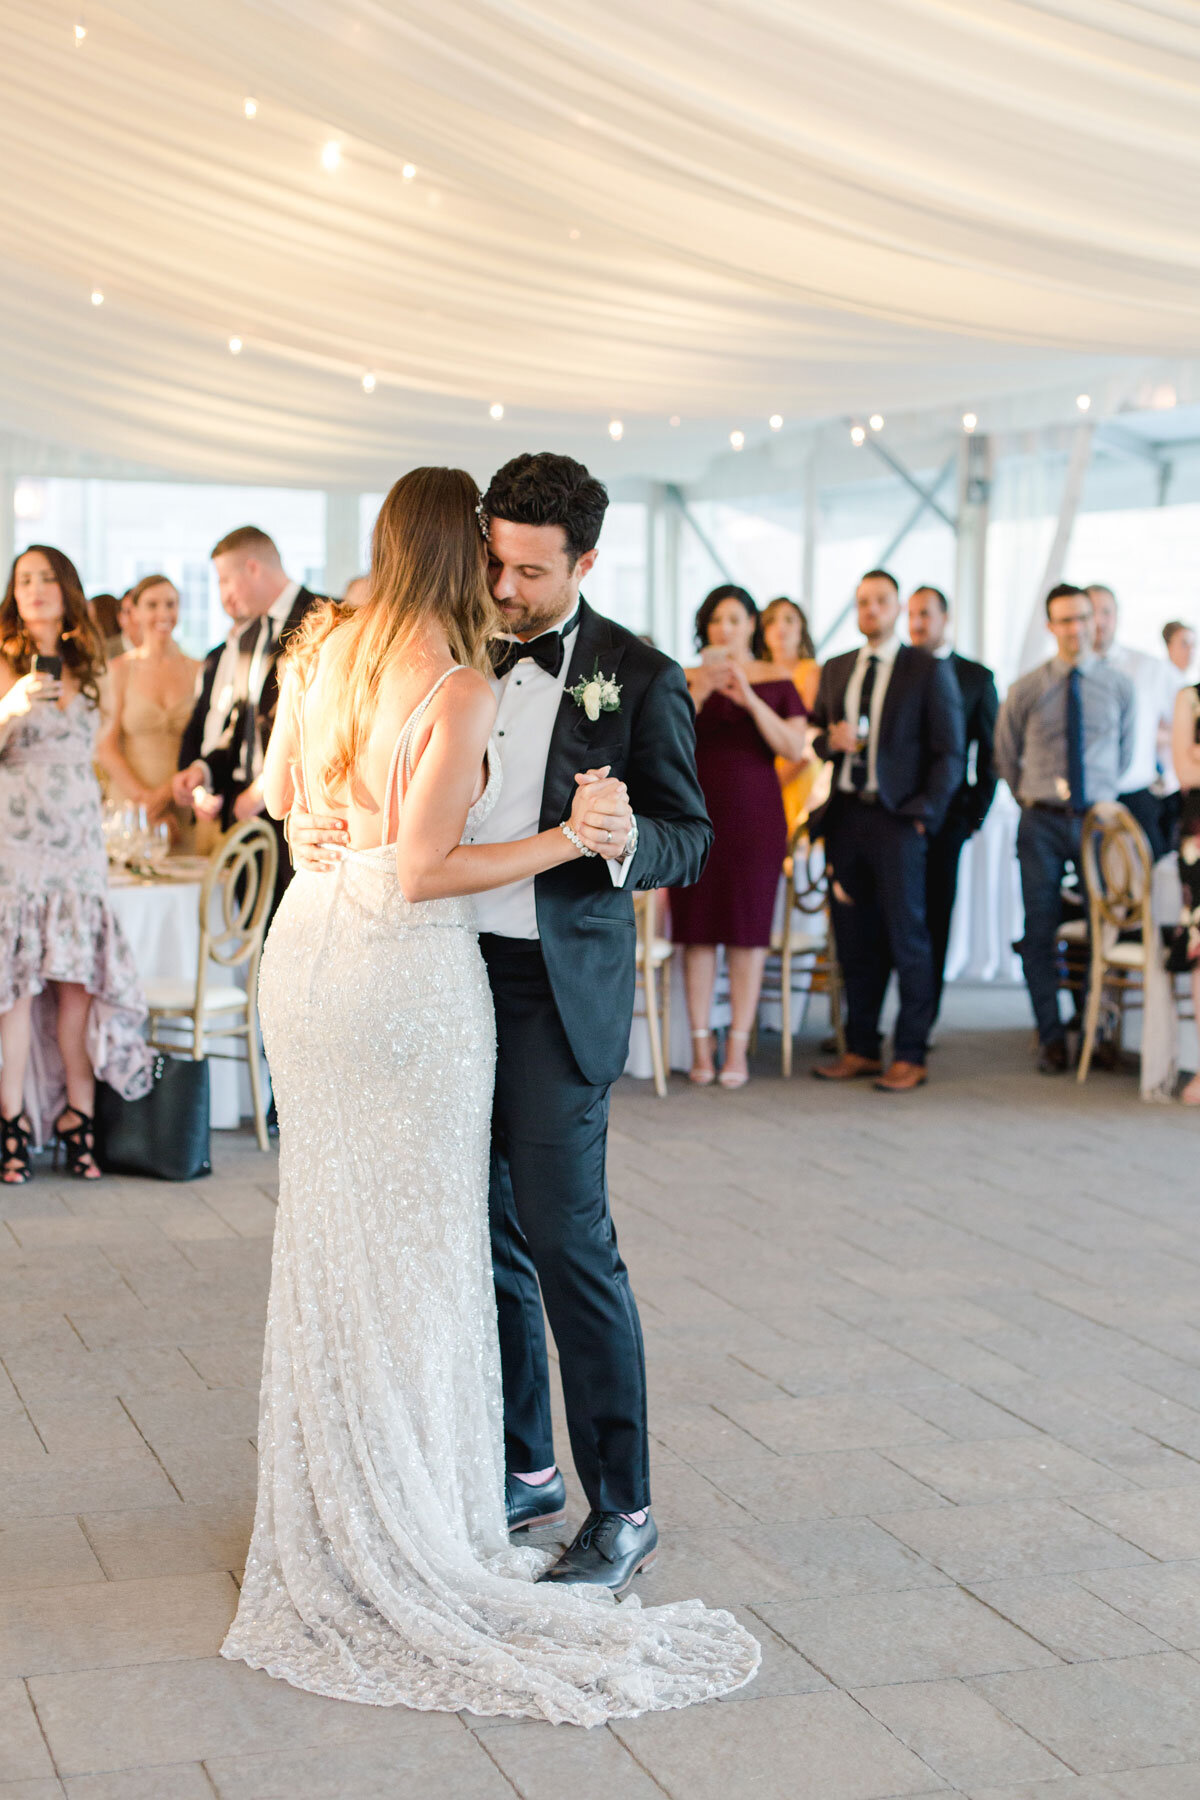 Chateau-des-Charmes-Wedding-Summer-Vineyard-Bride-Niagara-on-the-Lake-photos-by-Gemini-Photography-Ontario-0075.jpg